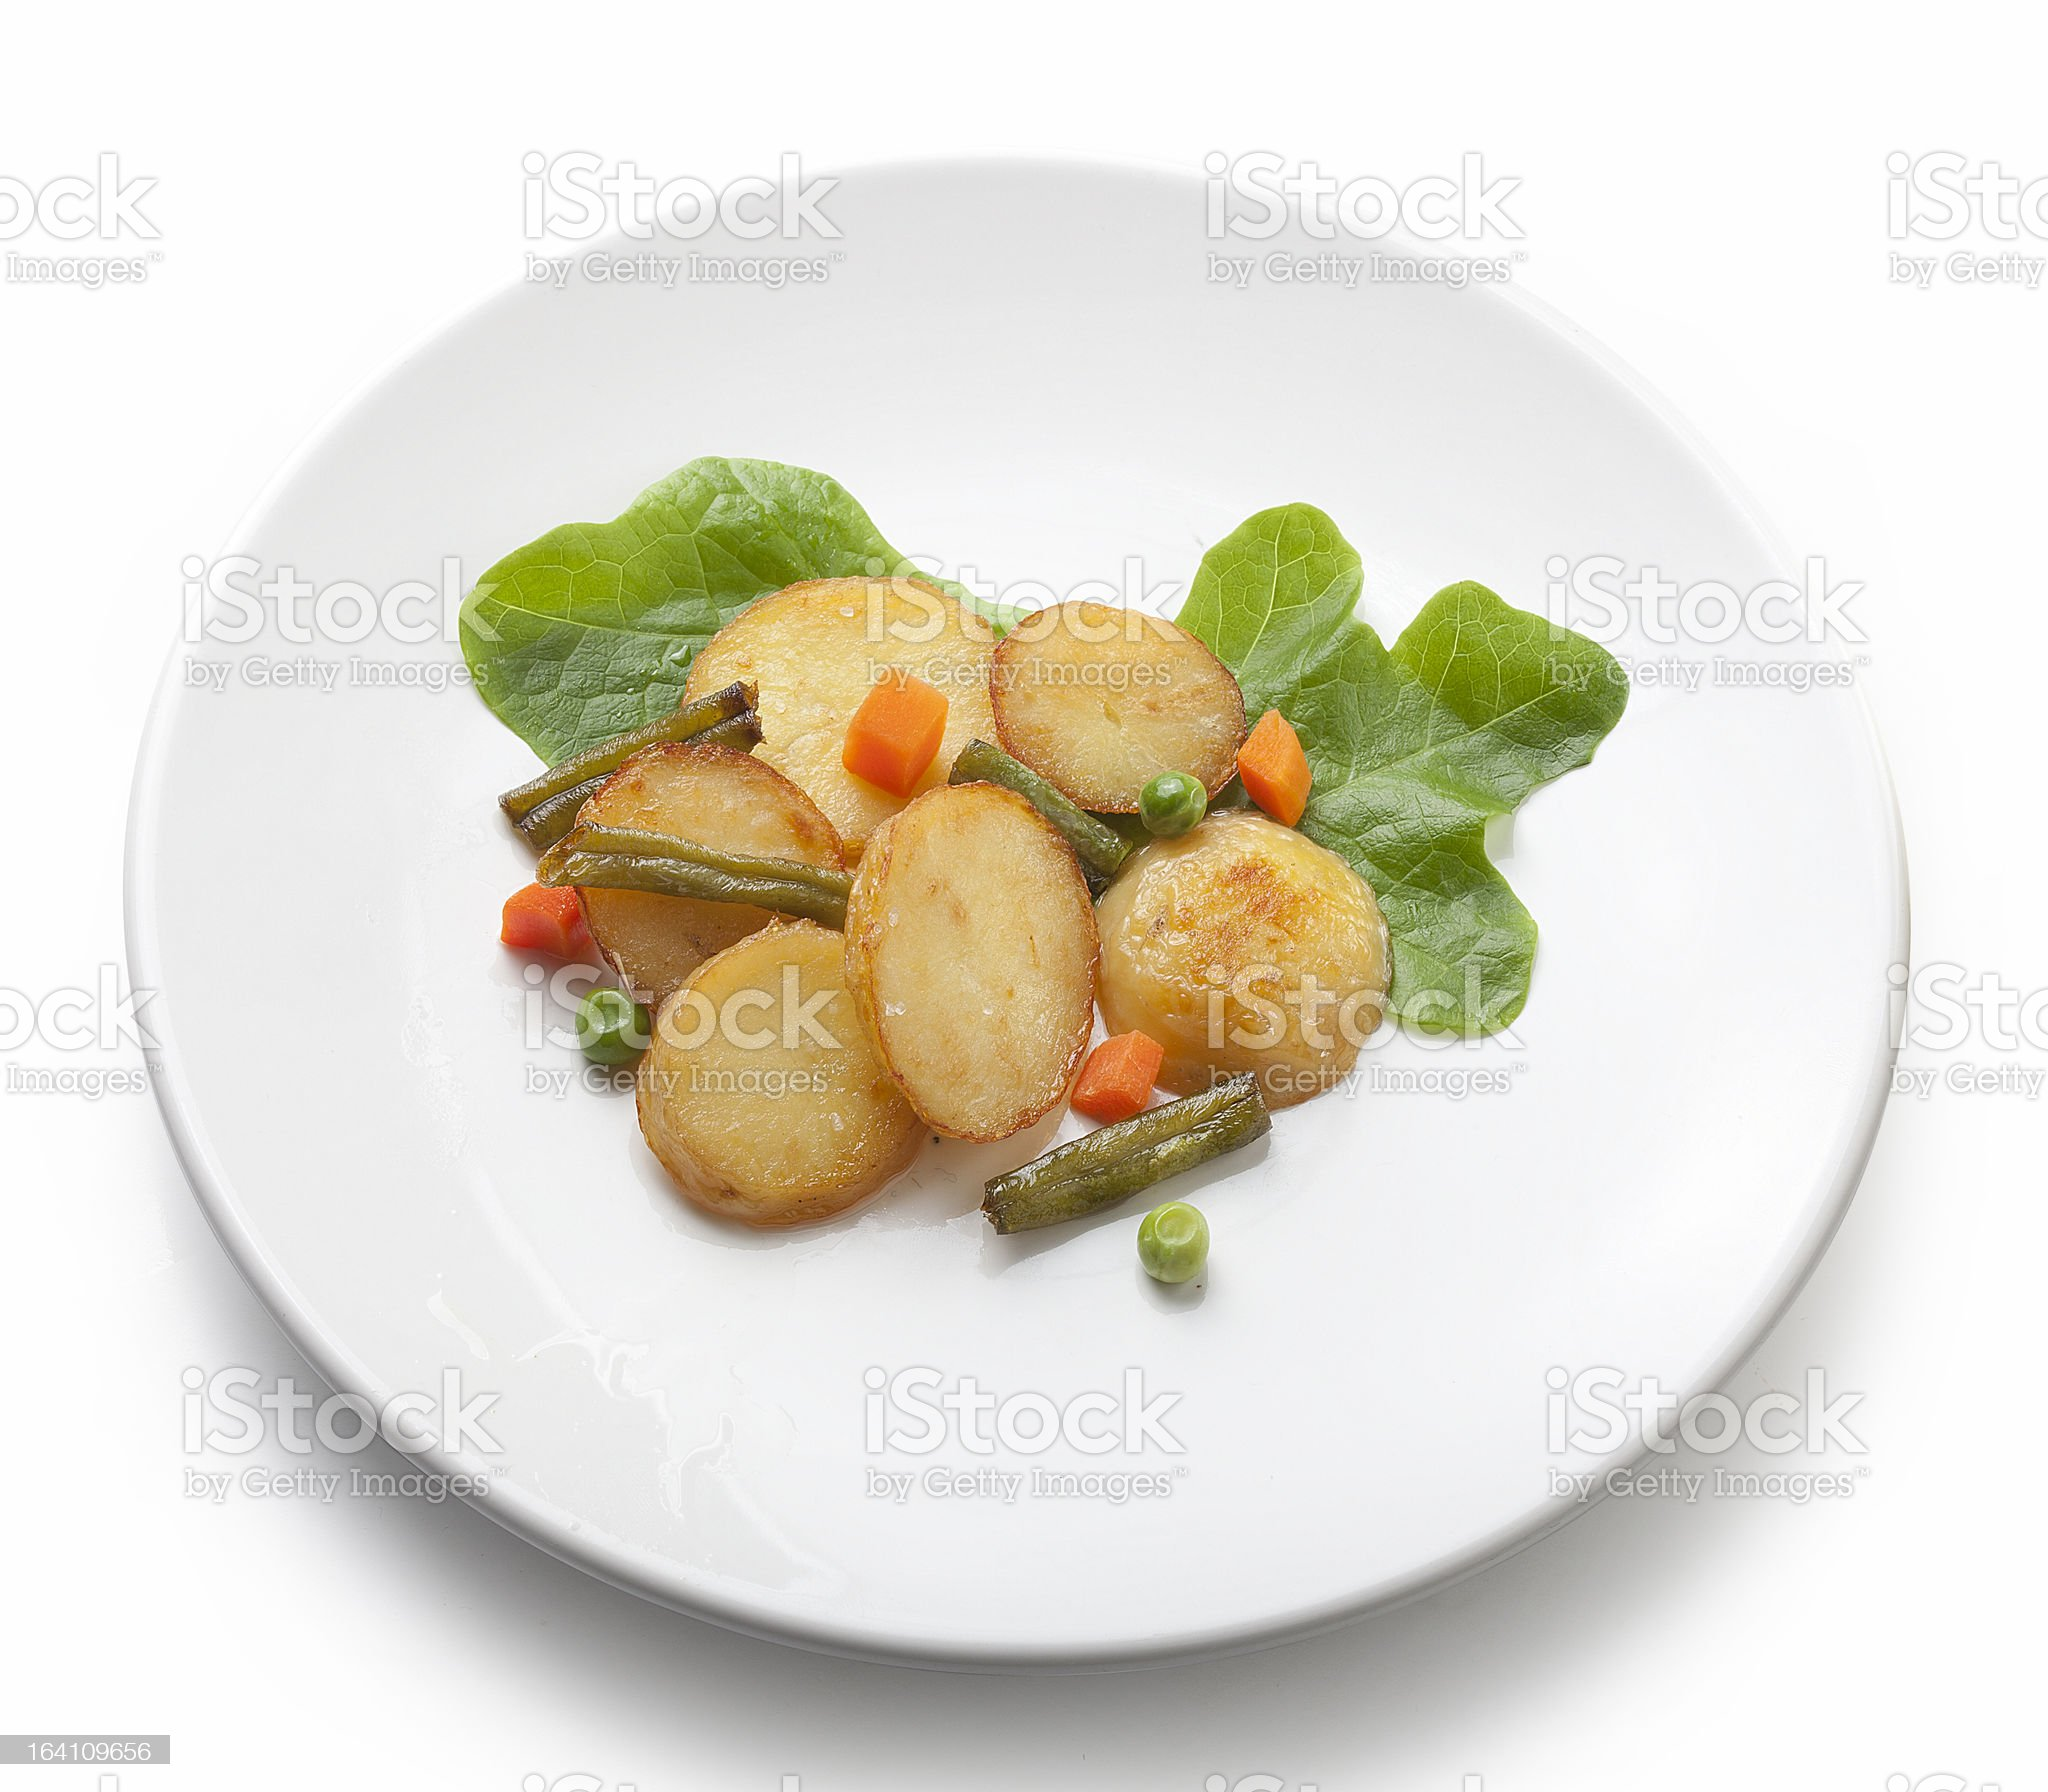 Fried potato royalty-free stock photo